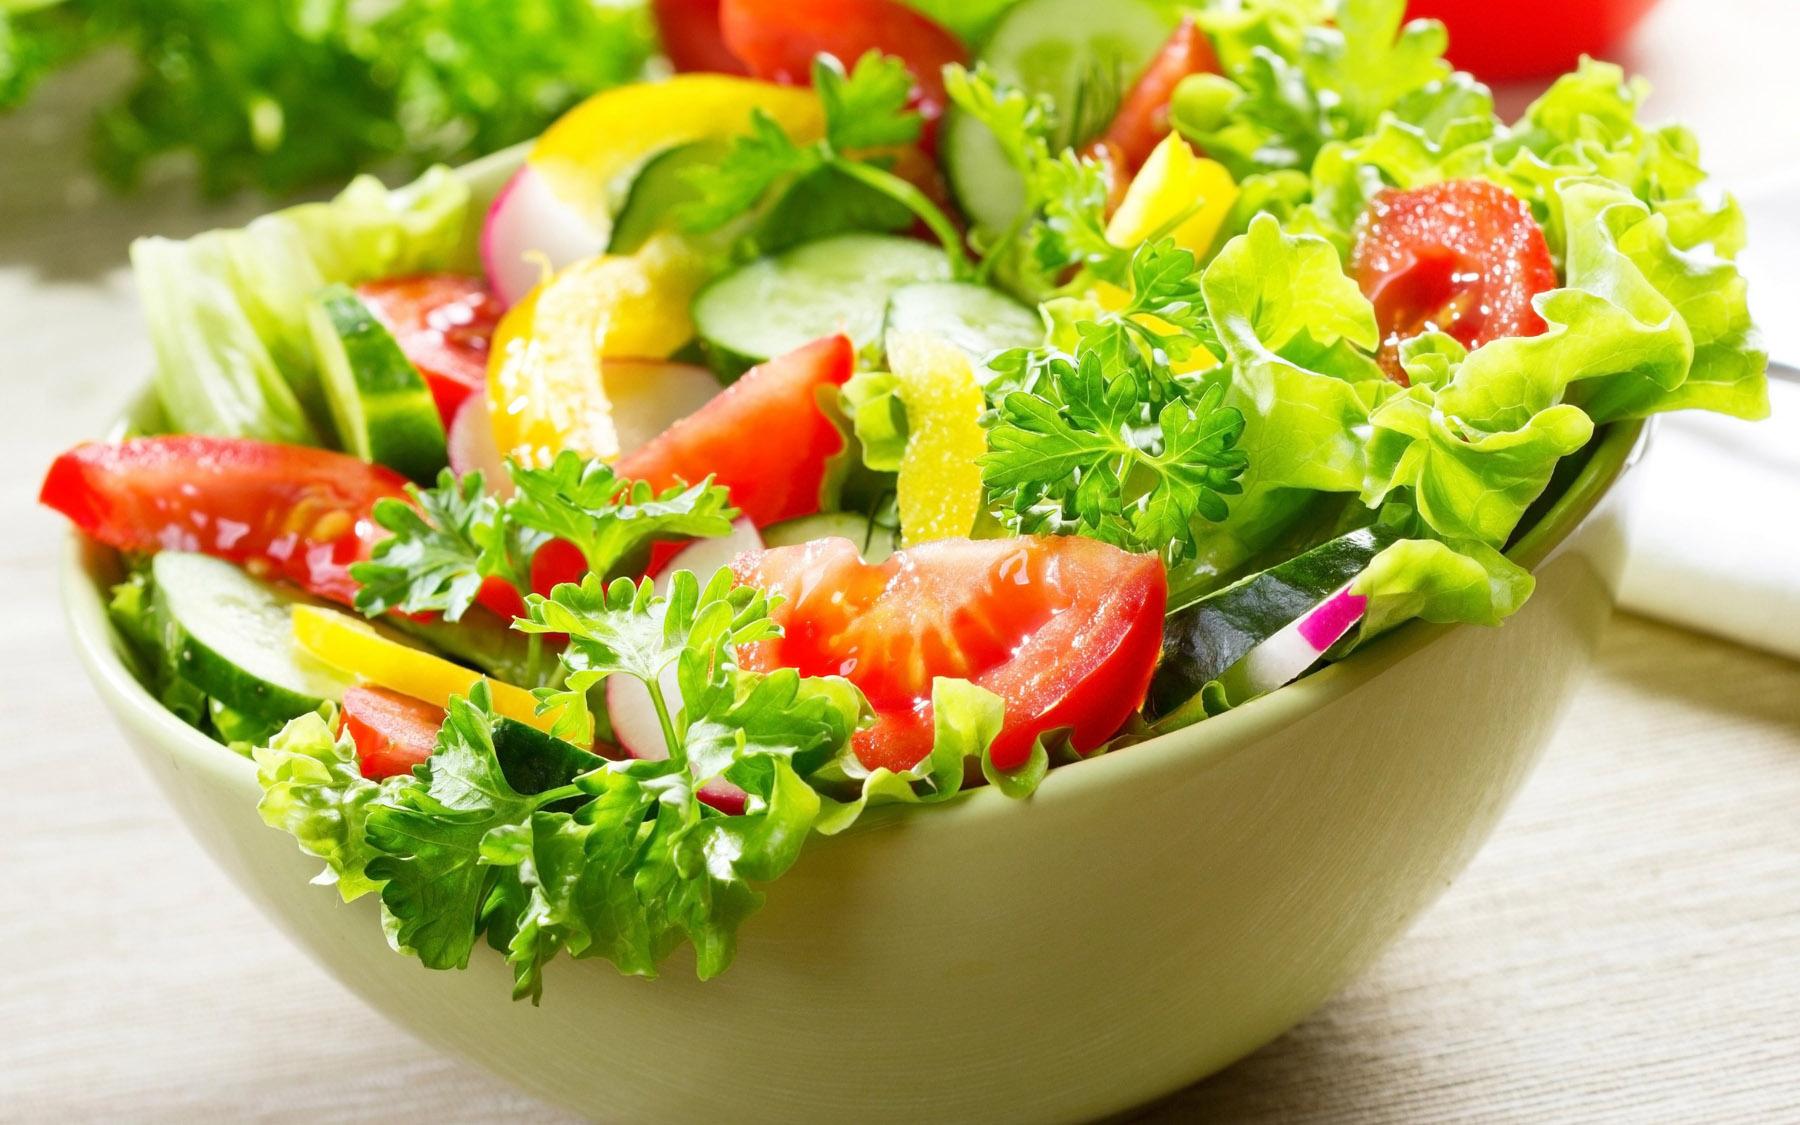 Salad Backgrounds on Wallpapers Vista